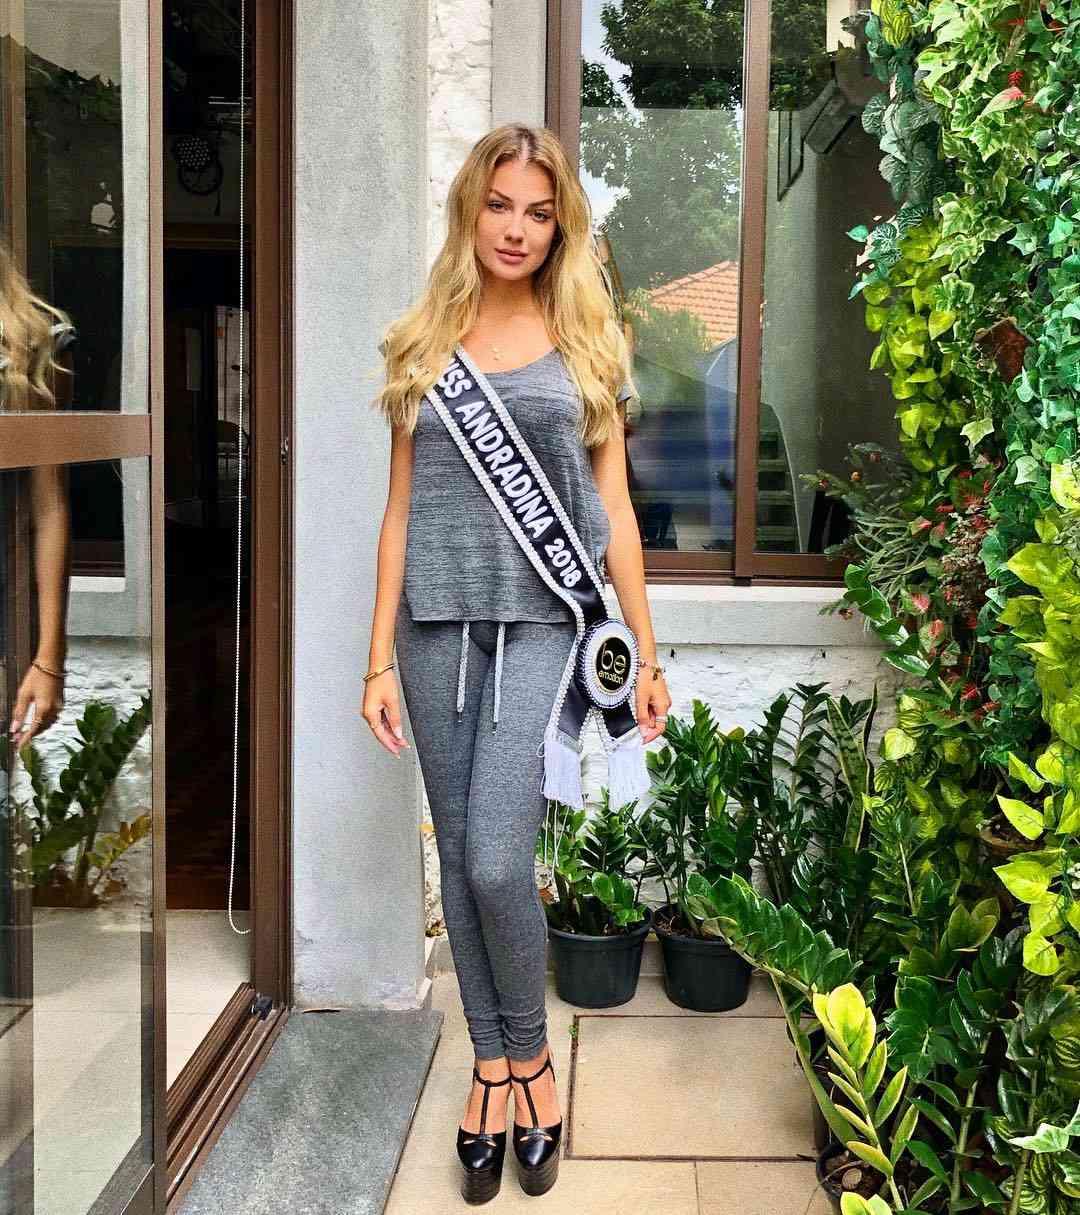 marcella portugal, miss andradina universo 2018. - Página 2 28158410